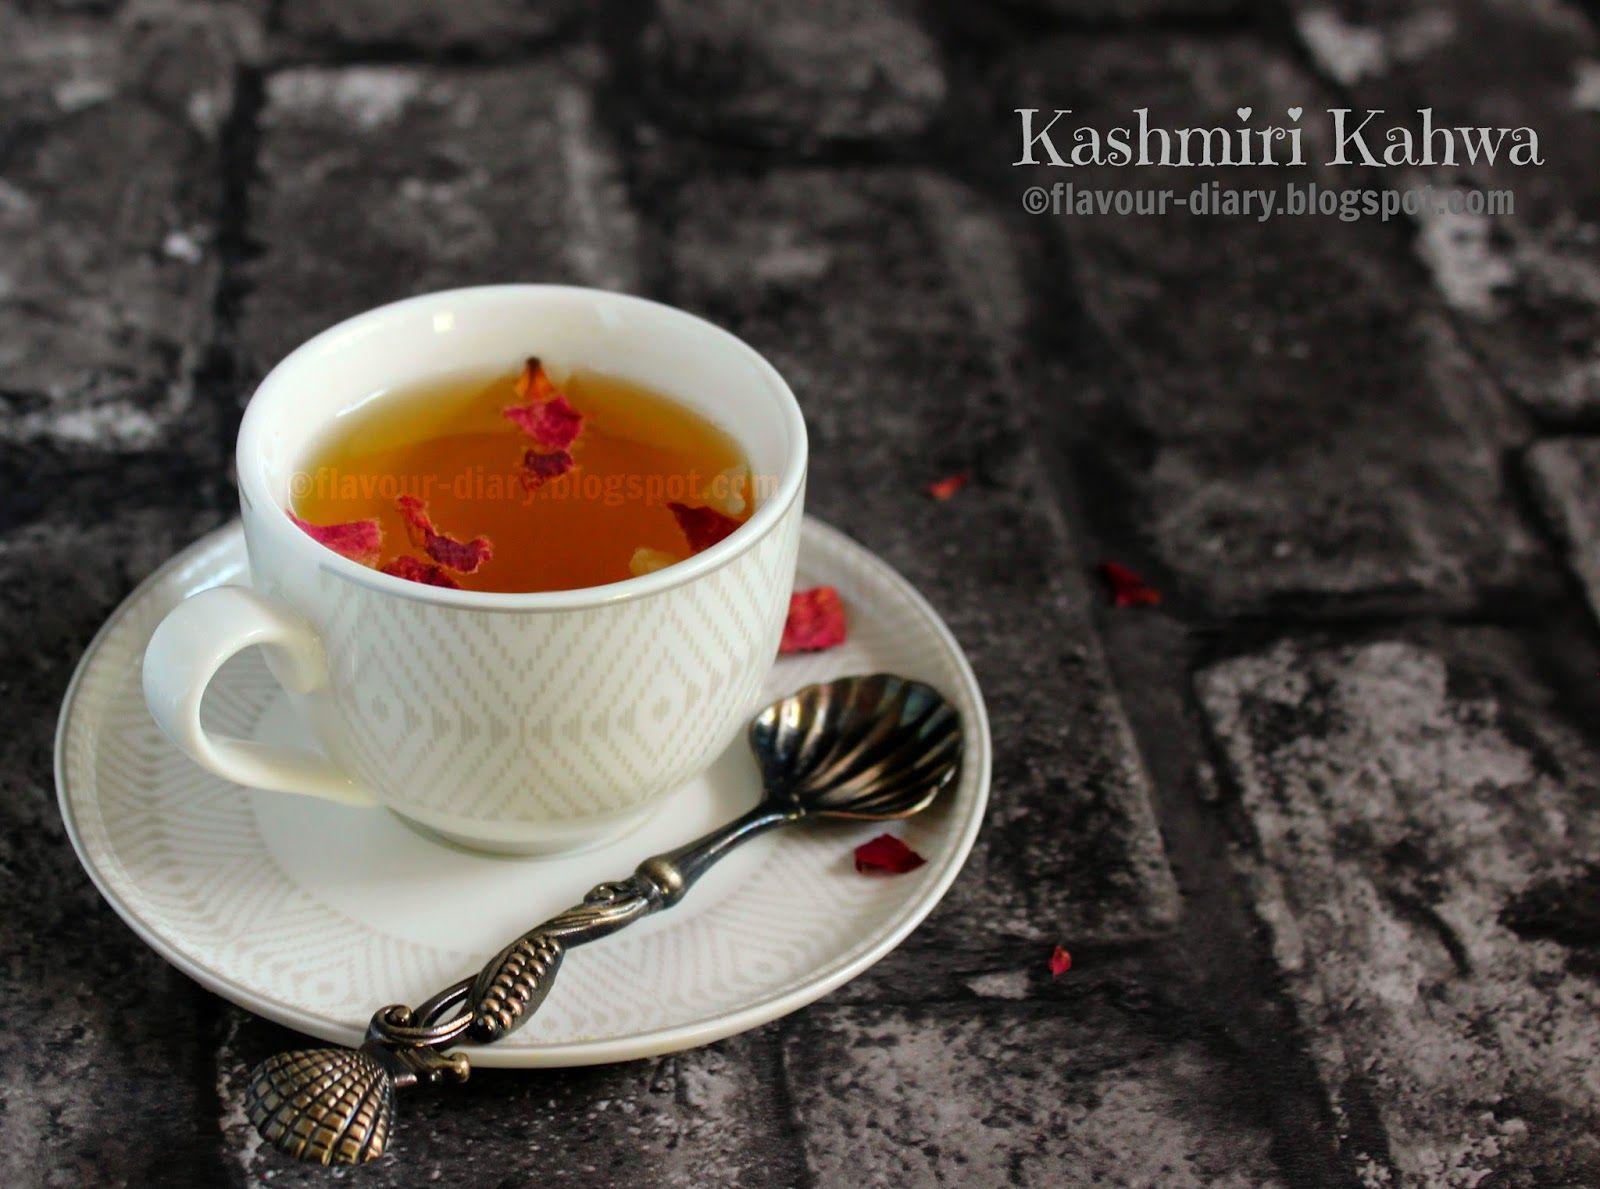 Kashmiri Kong Kahwa Tea Recipe (With images) Saffron tea